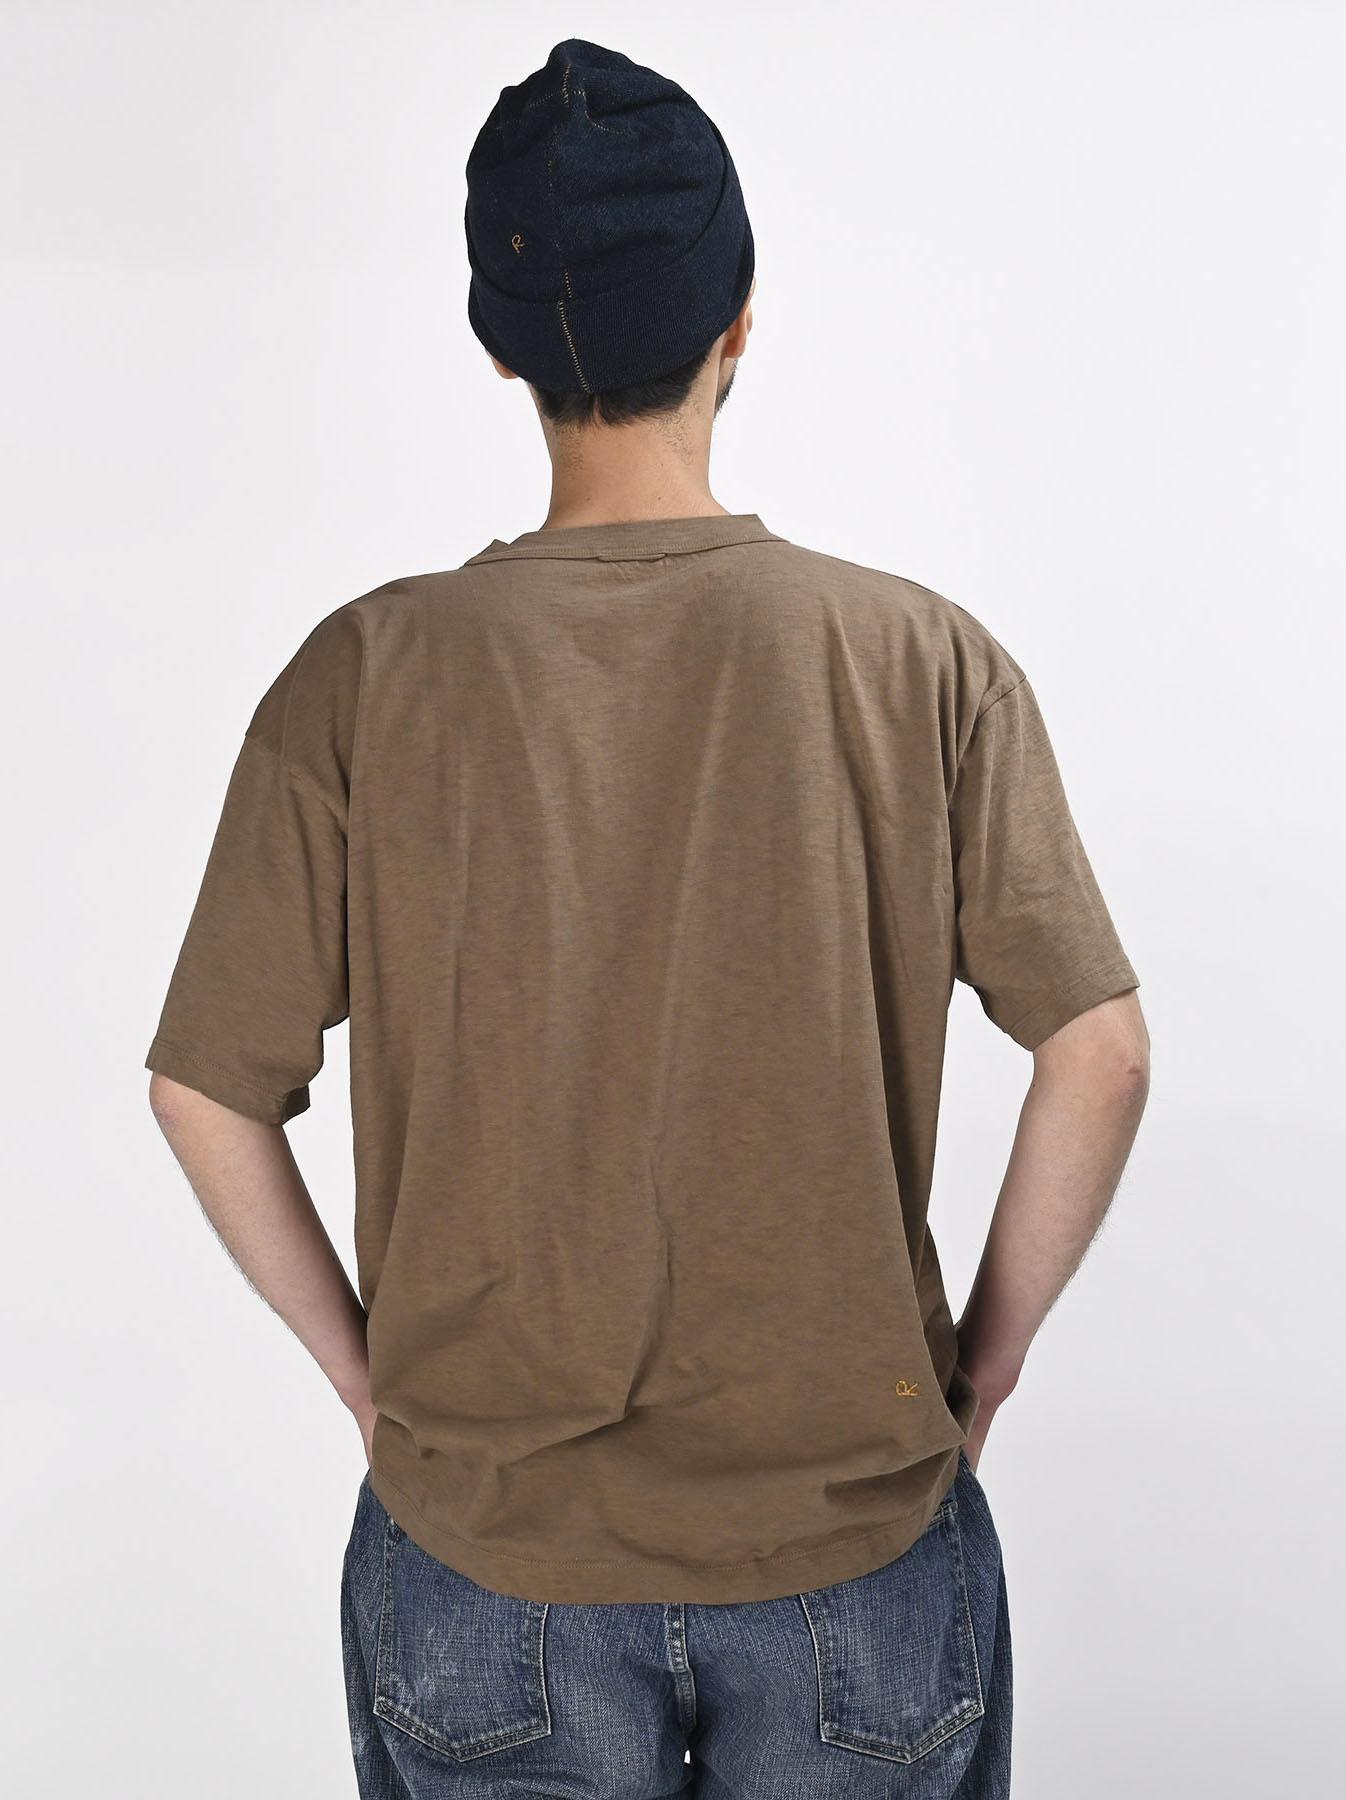 Hayama-kun Embroidered 908 Ocean T-shirt (0621)-5